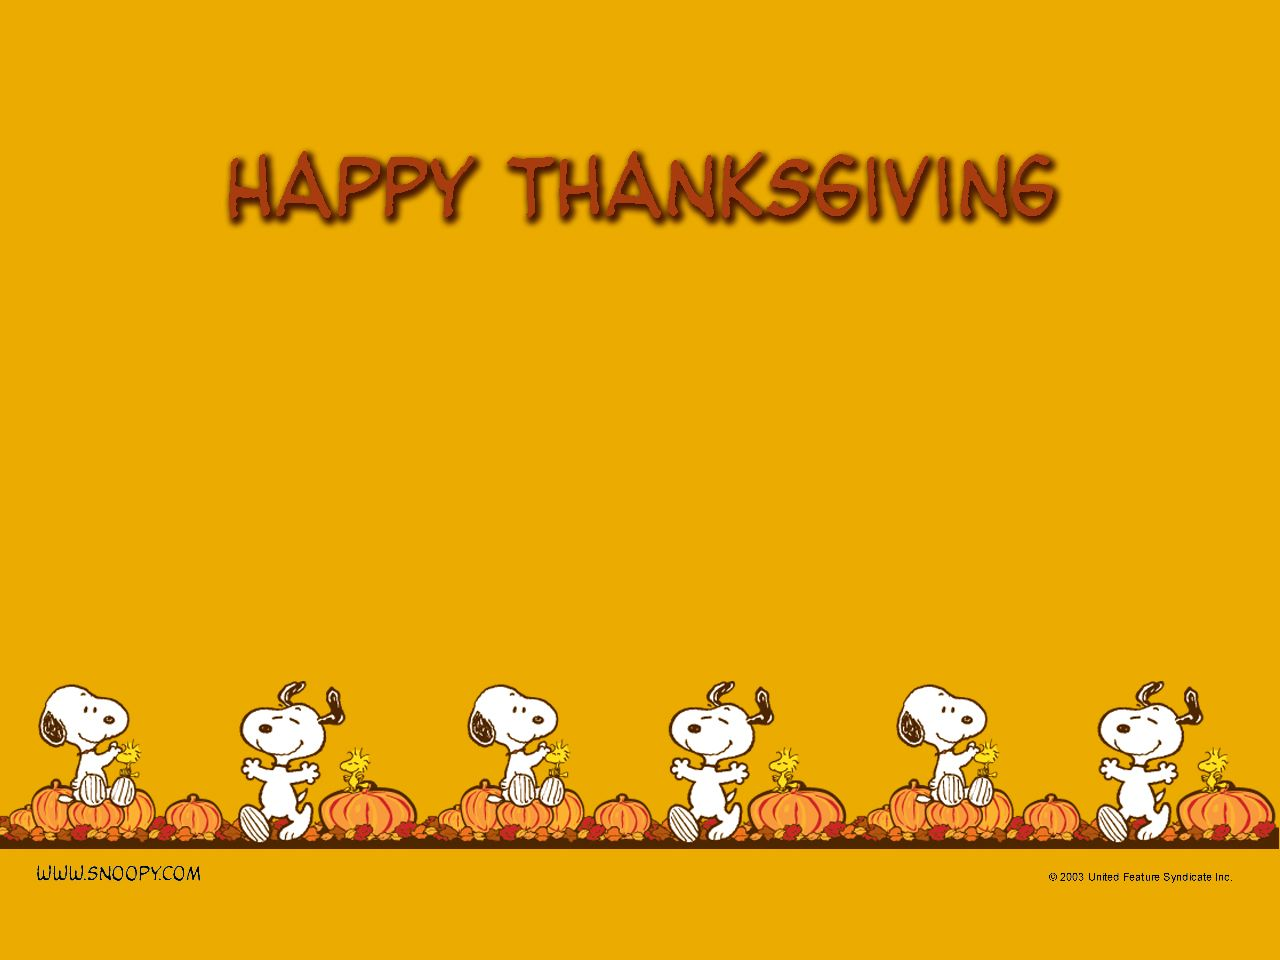 Disney Thanksgiving Desktop Wallpapers Top Free Disney Thanksgiving Desktop Backgrounds Wallpaperaccess